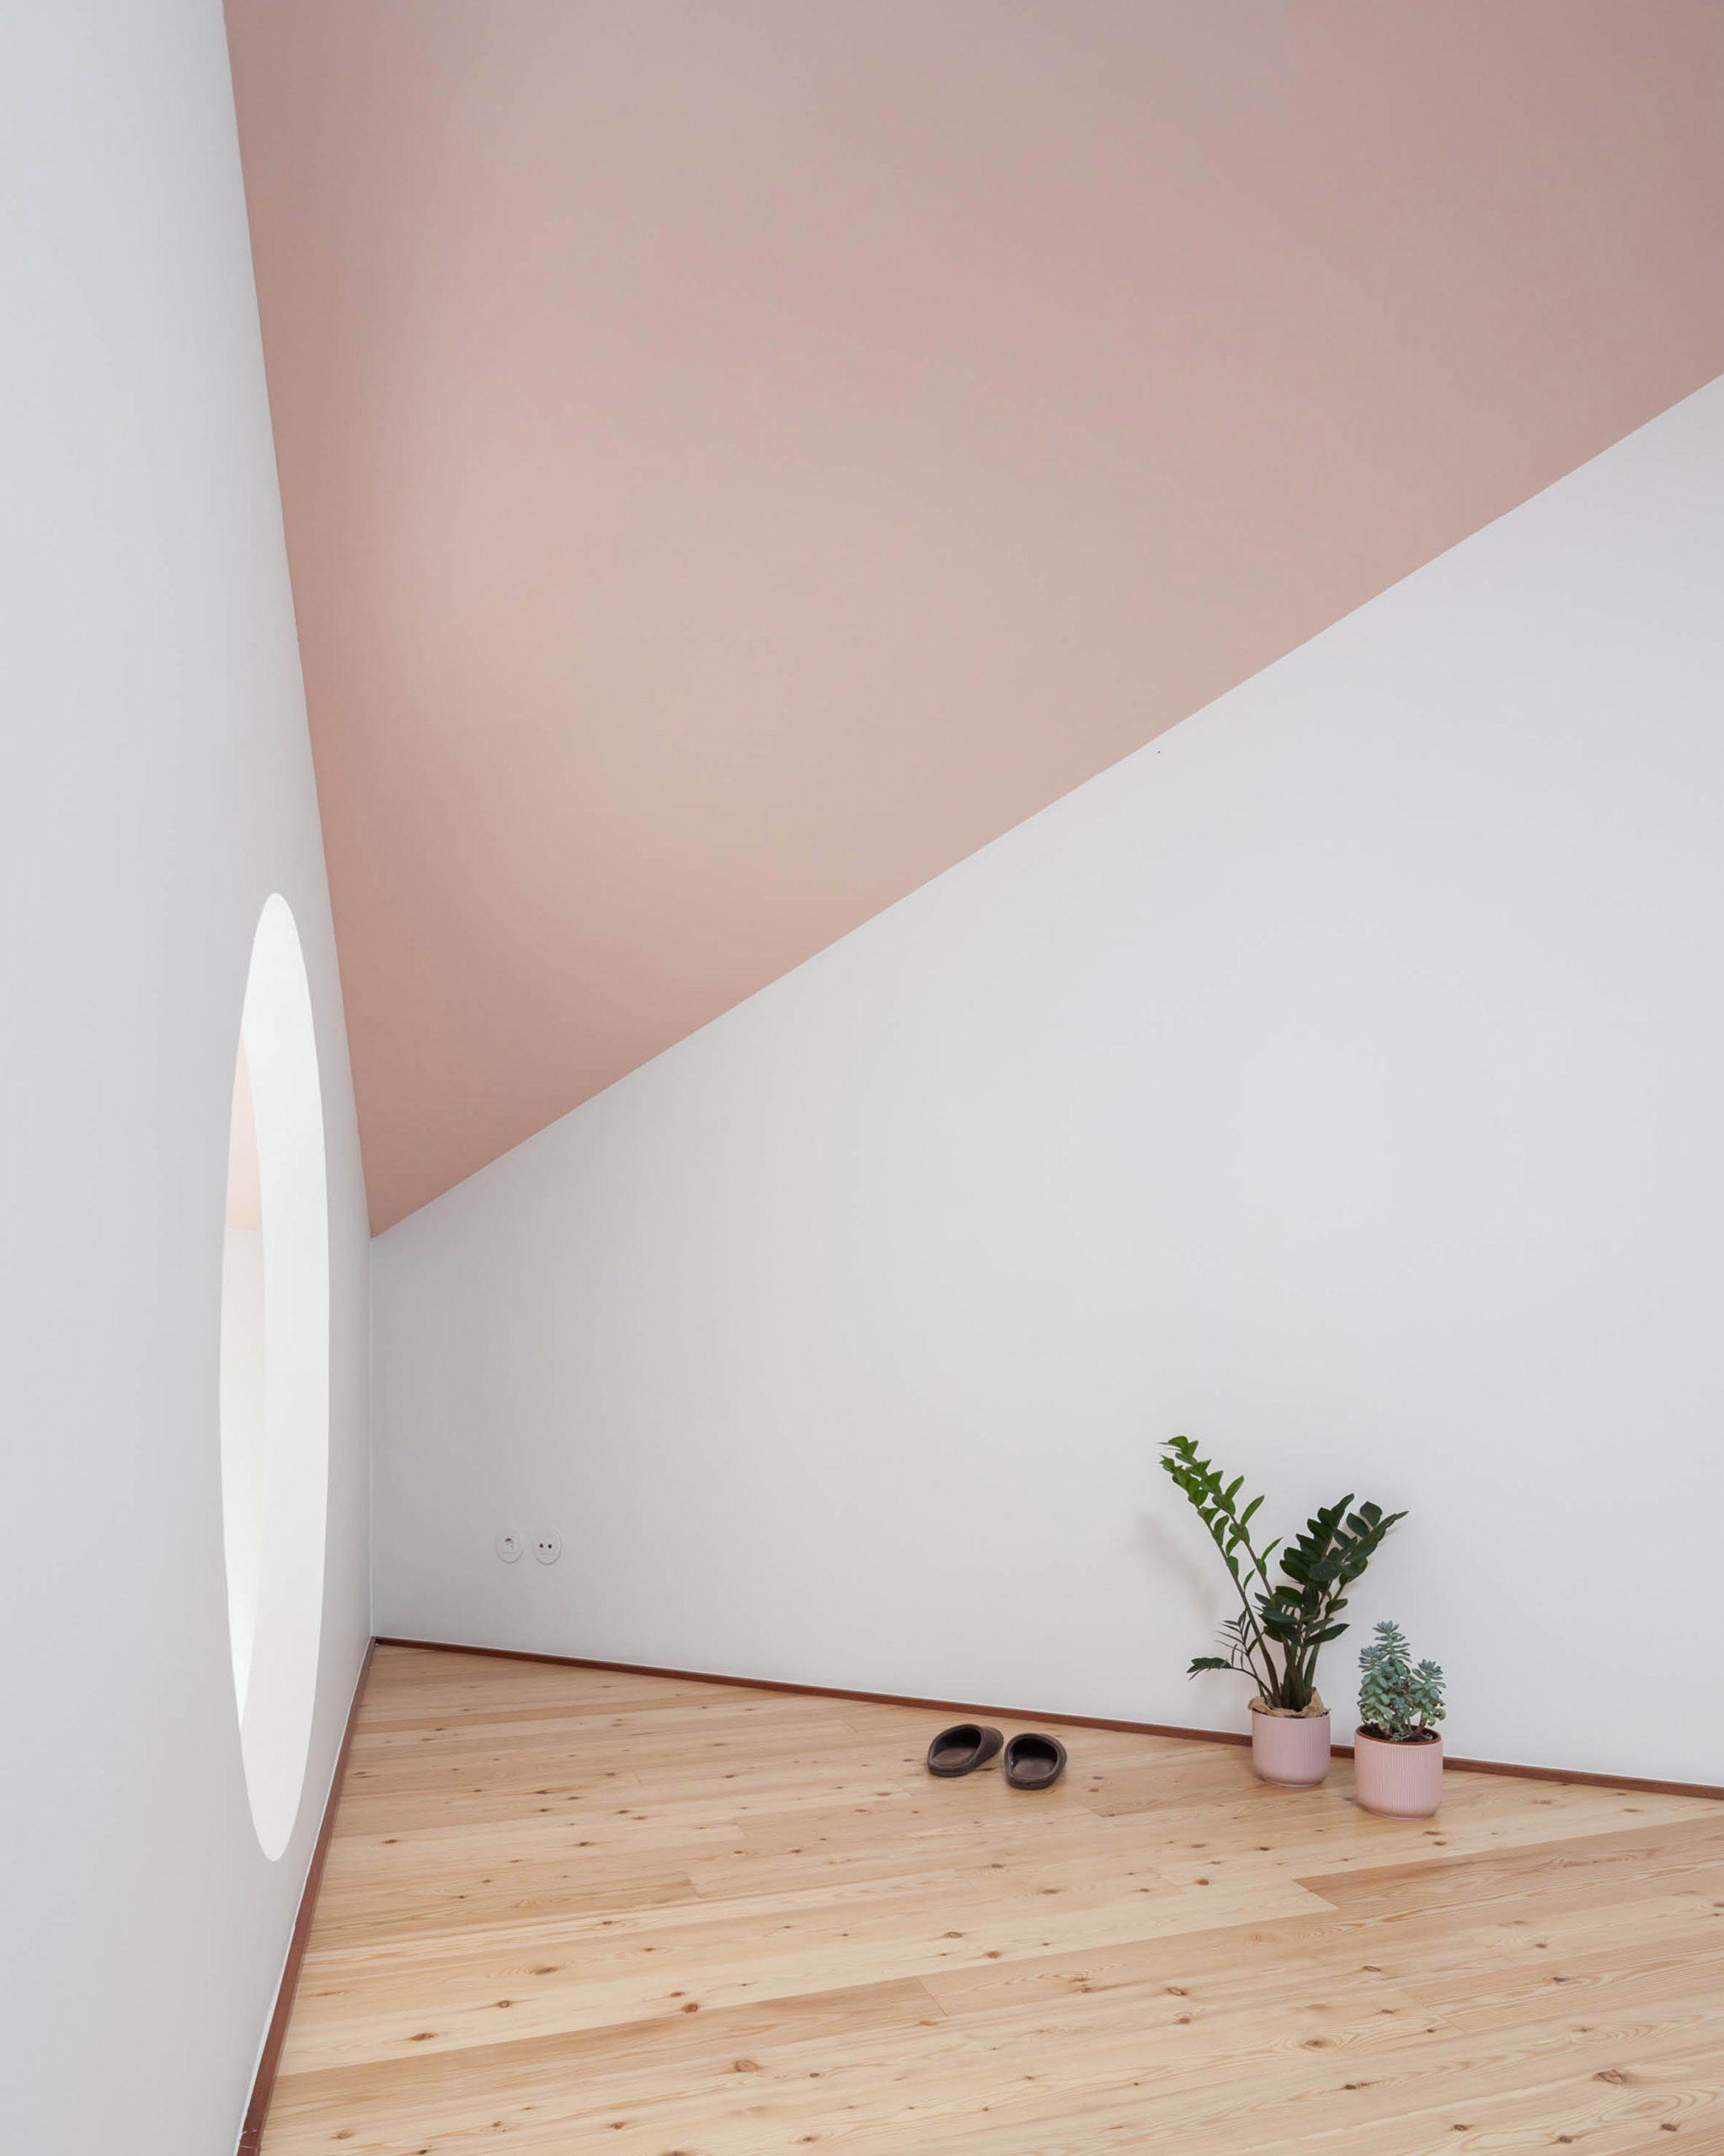 Amazing Concrete Micro-homes by Fala Atelier – Fubiz Media Design